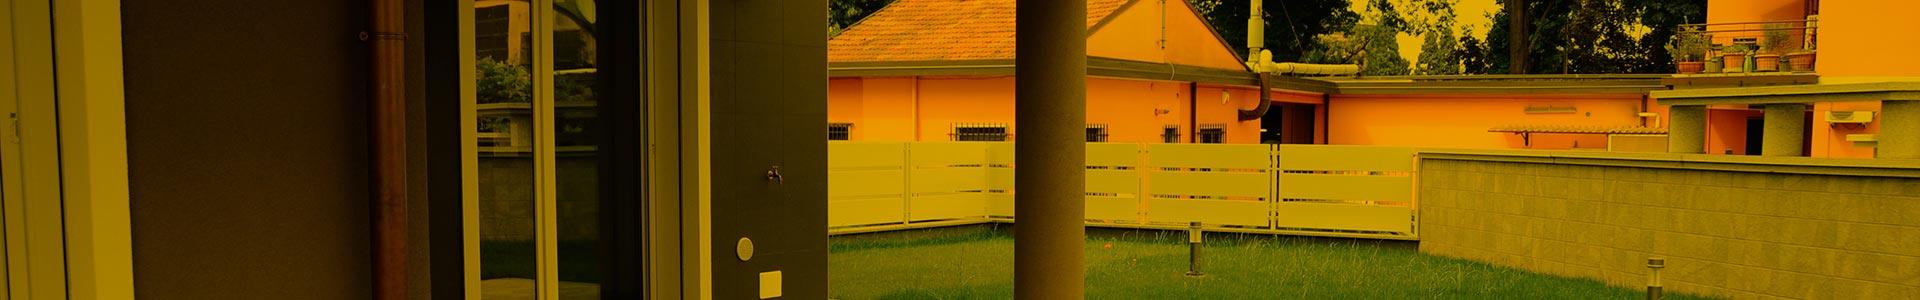 immobiliare bramante planimetrie residenza santa maria